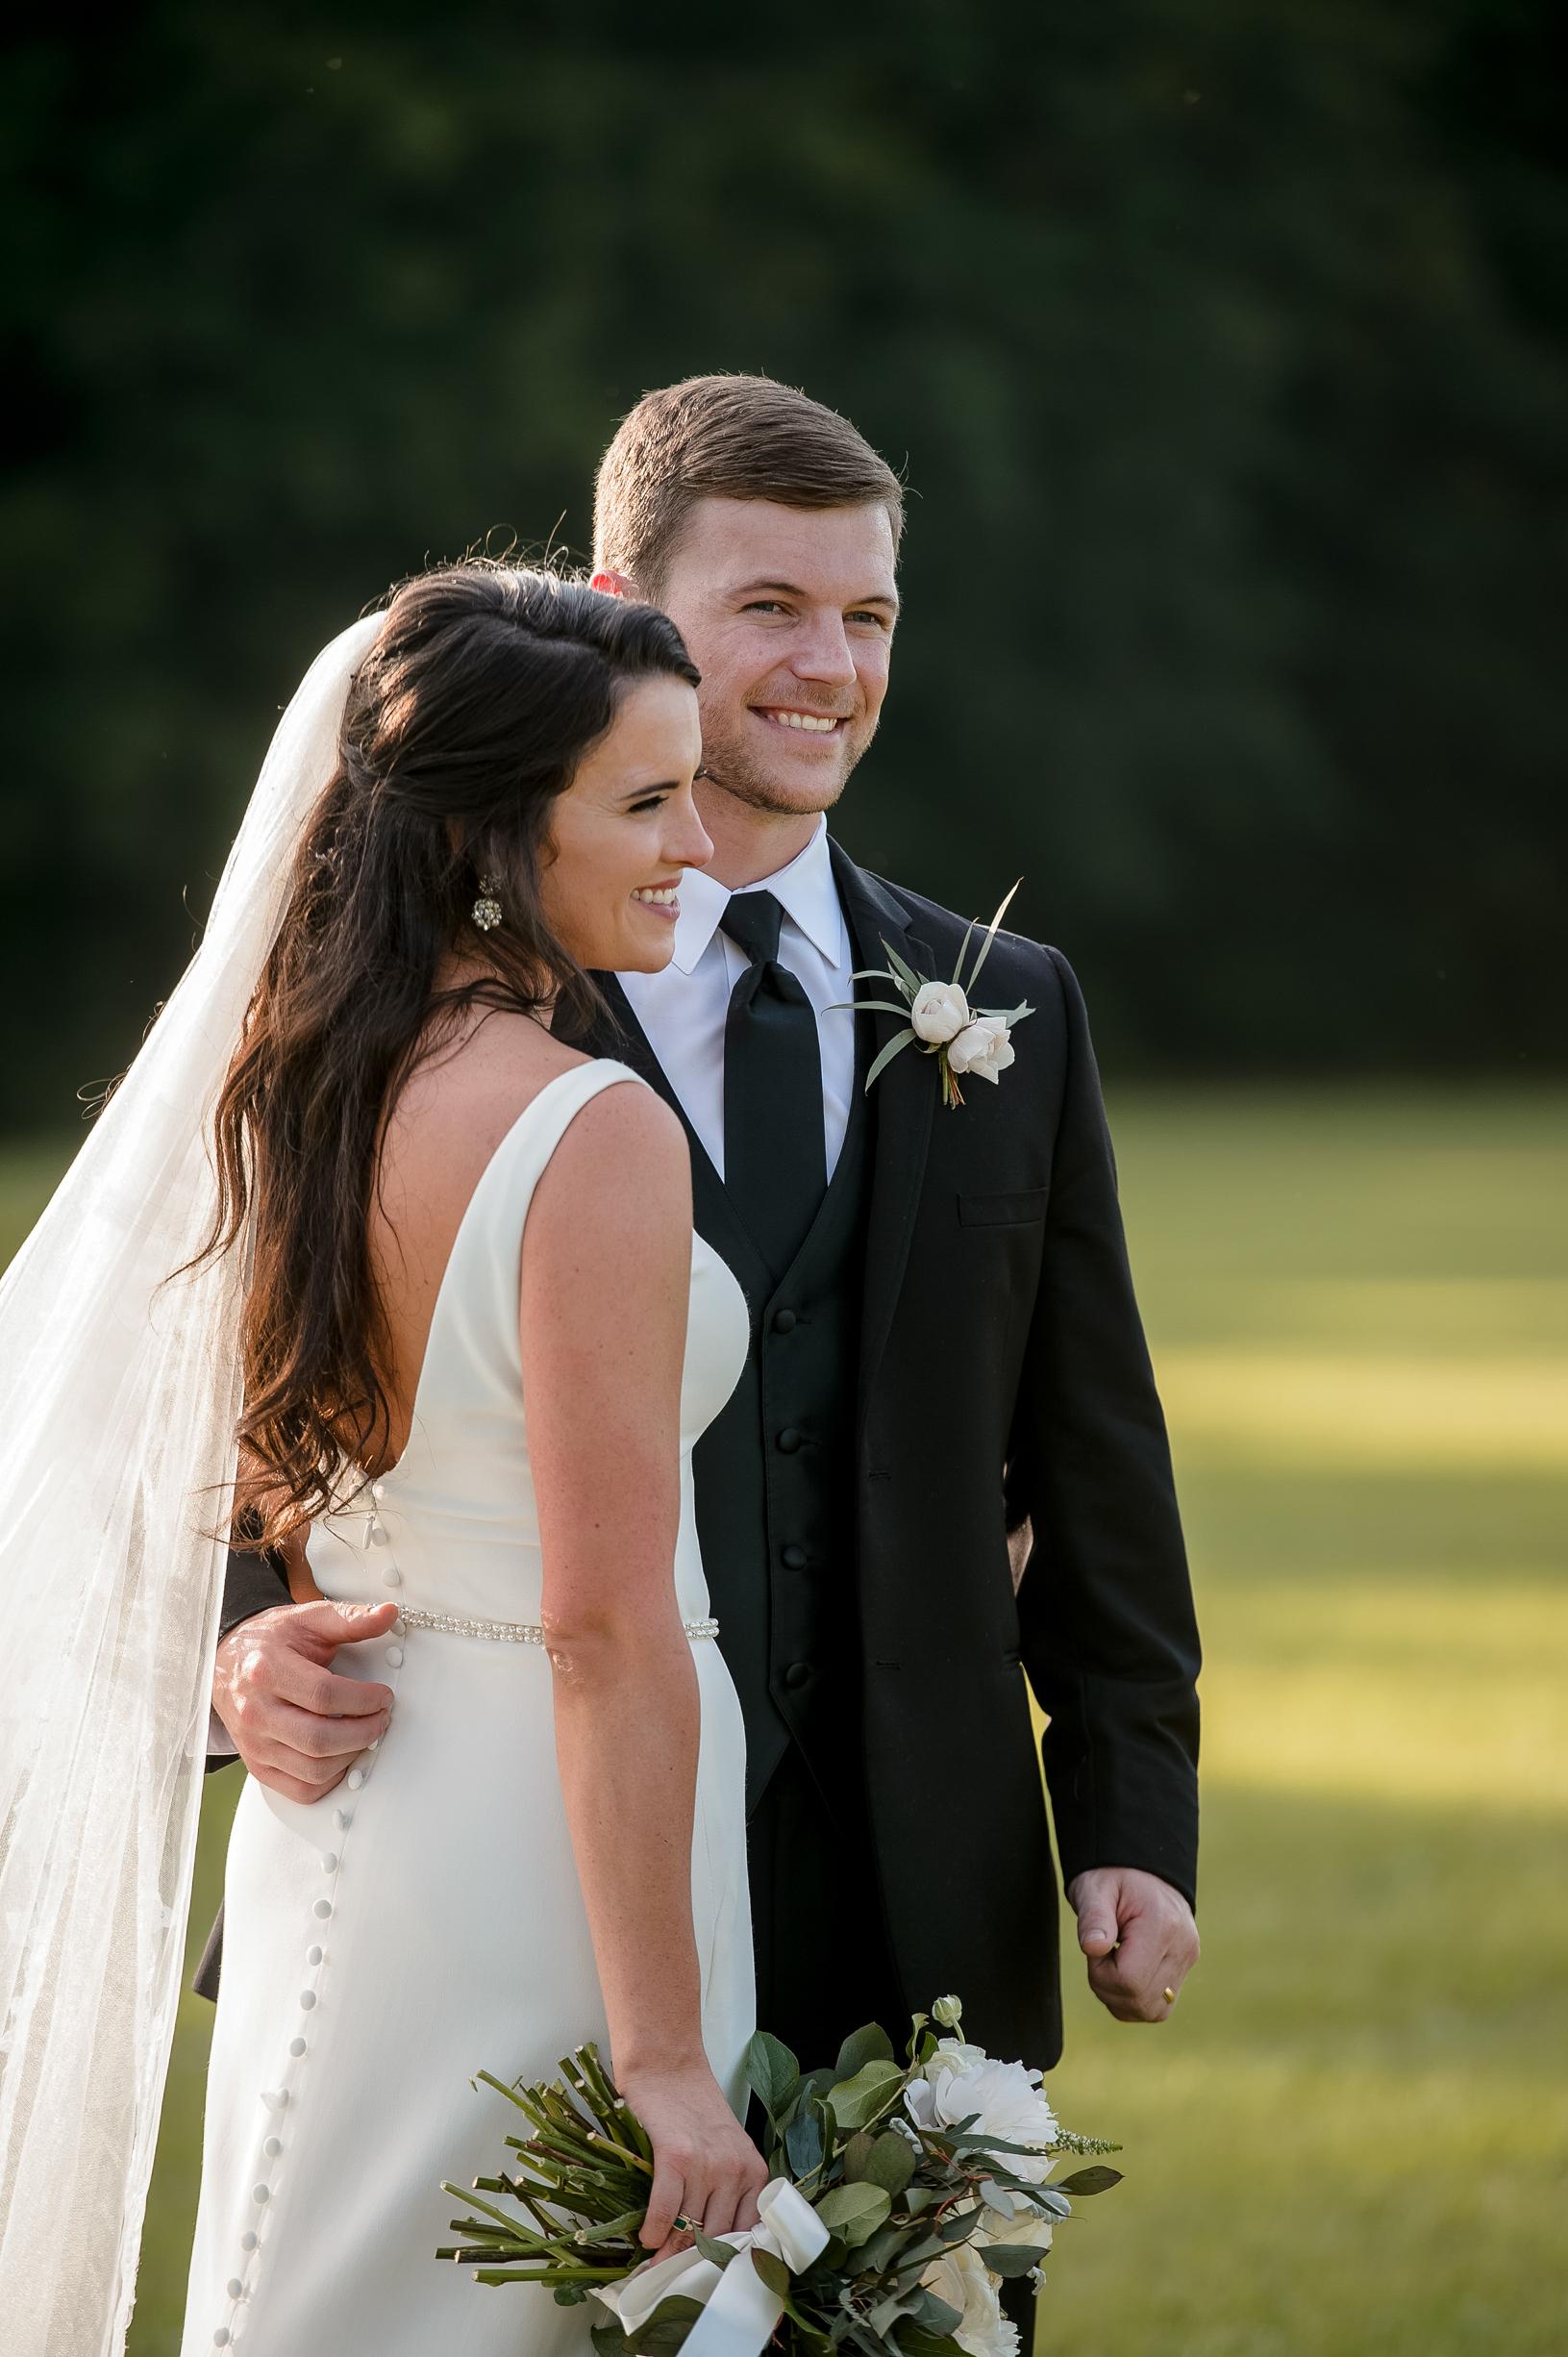 Royal Wedding with Outdoor Reception-44.JPG